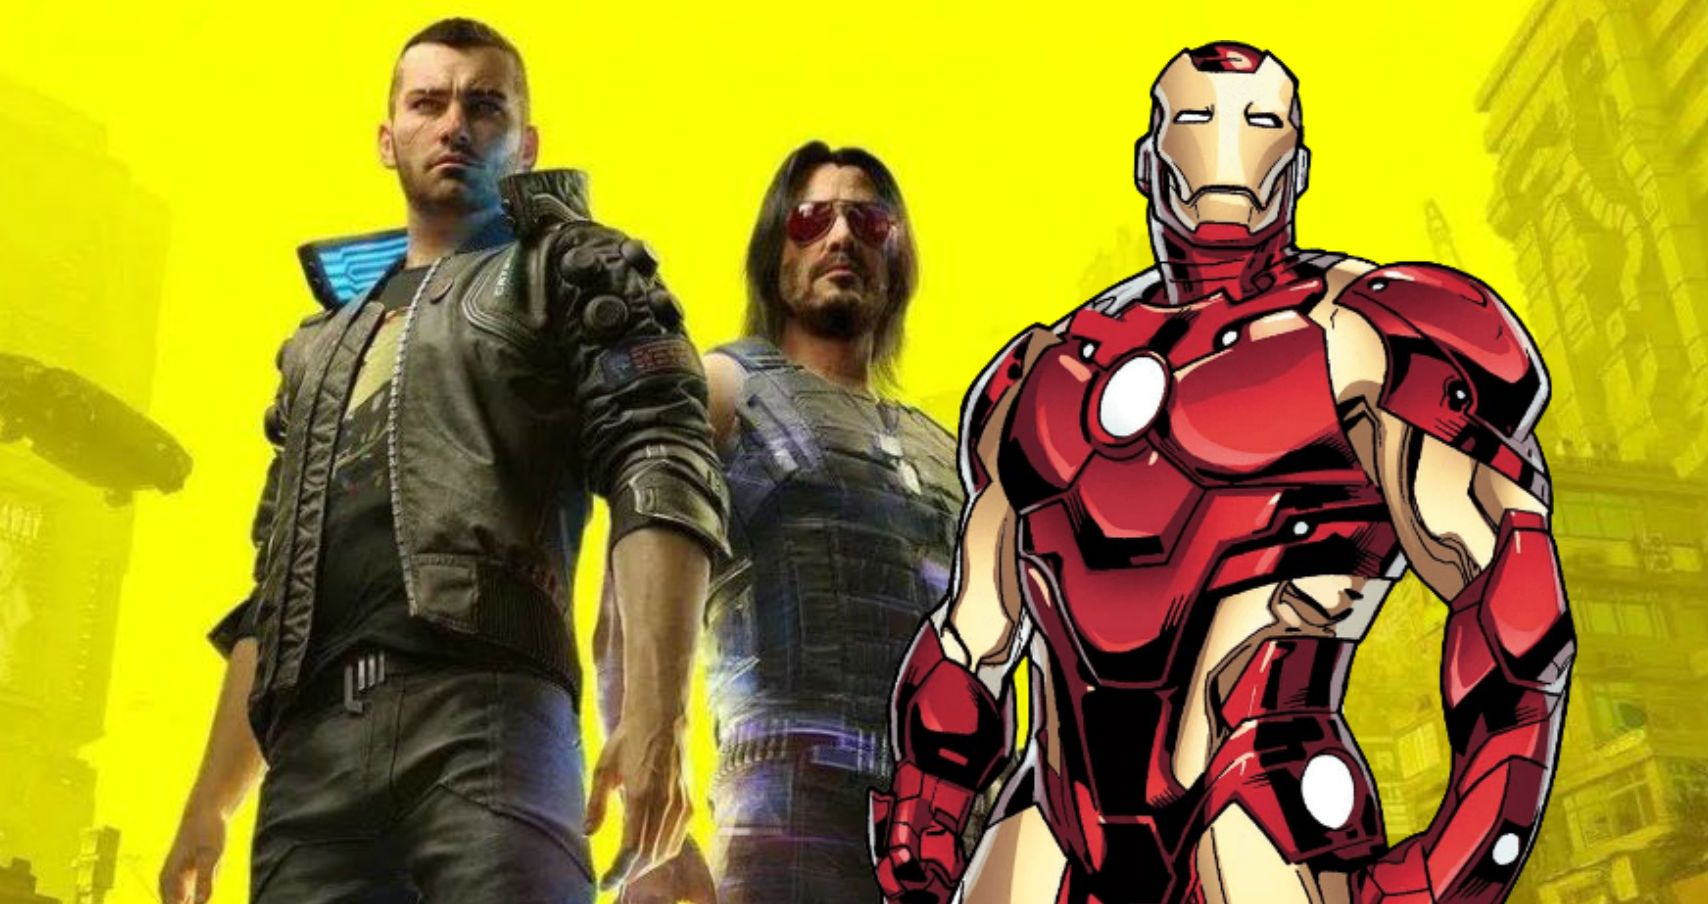 Cyberpunk 2077 Has A Massive Iron Man Easter Egg | TheGamer